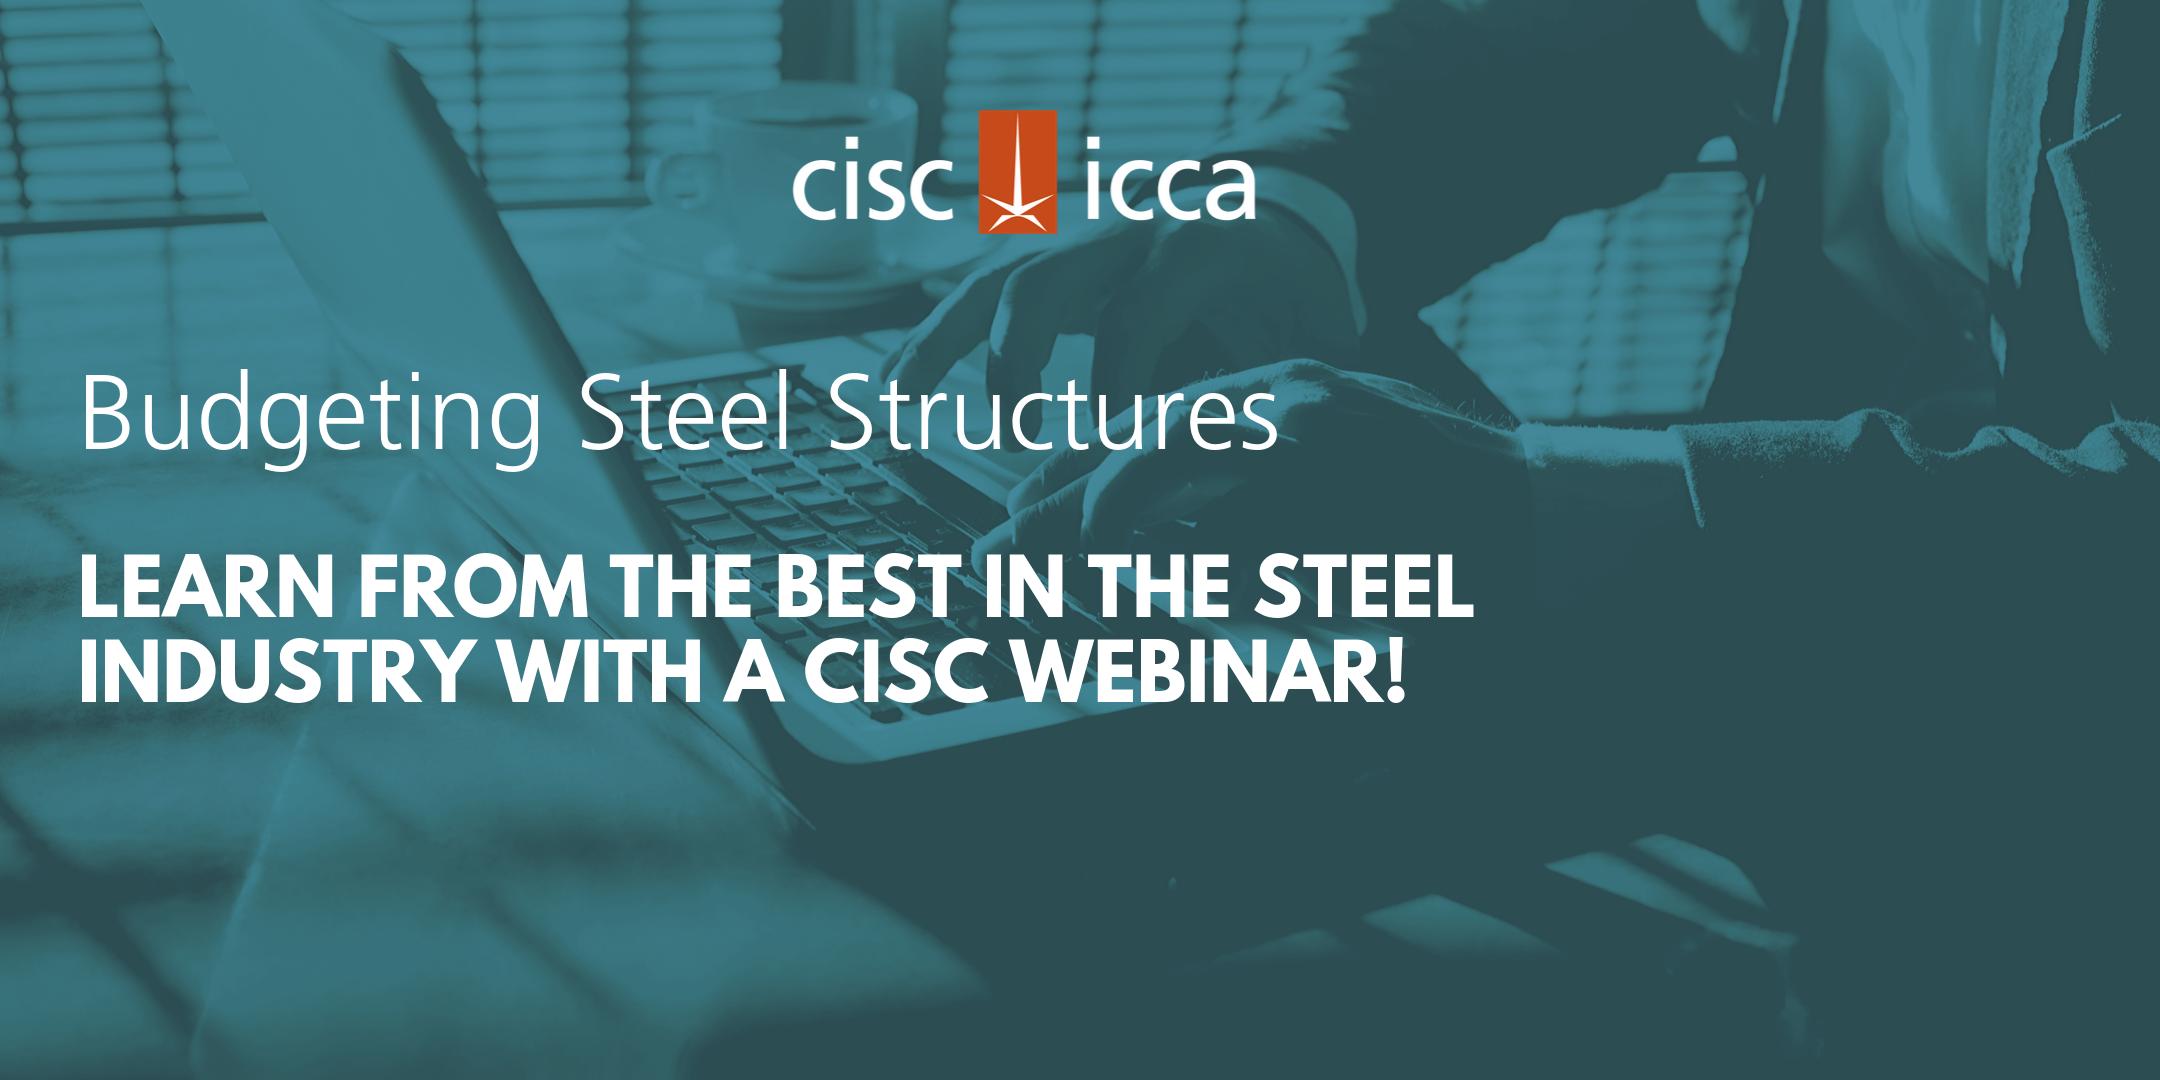 CISC Budgeting Steel Structures Webinar